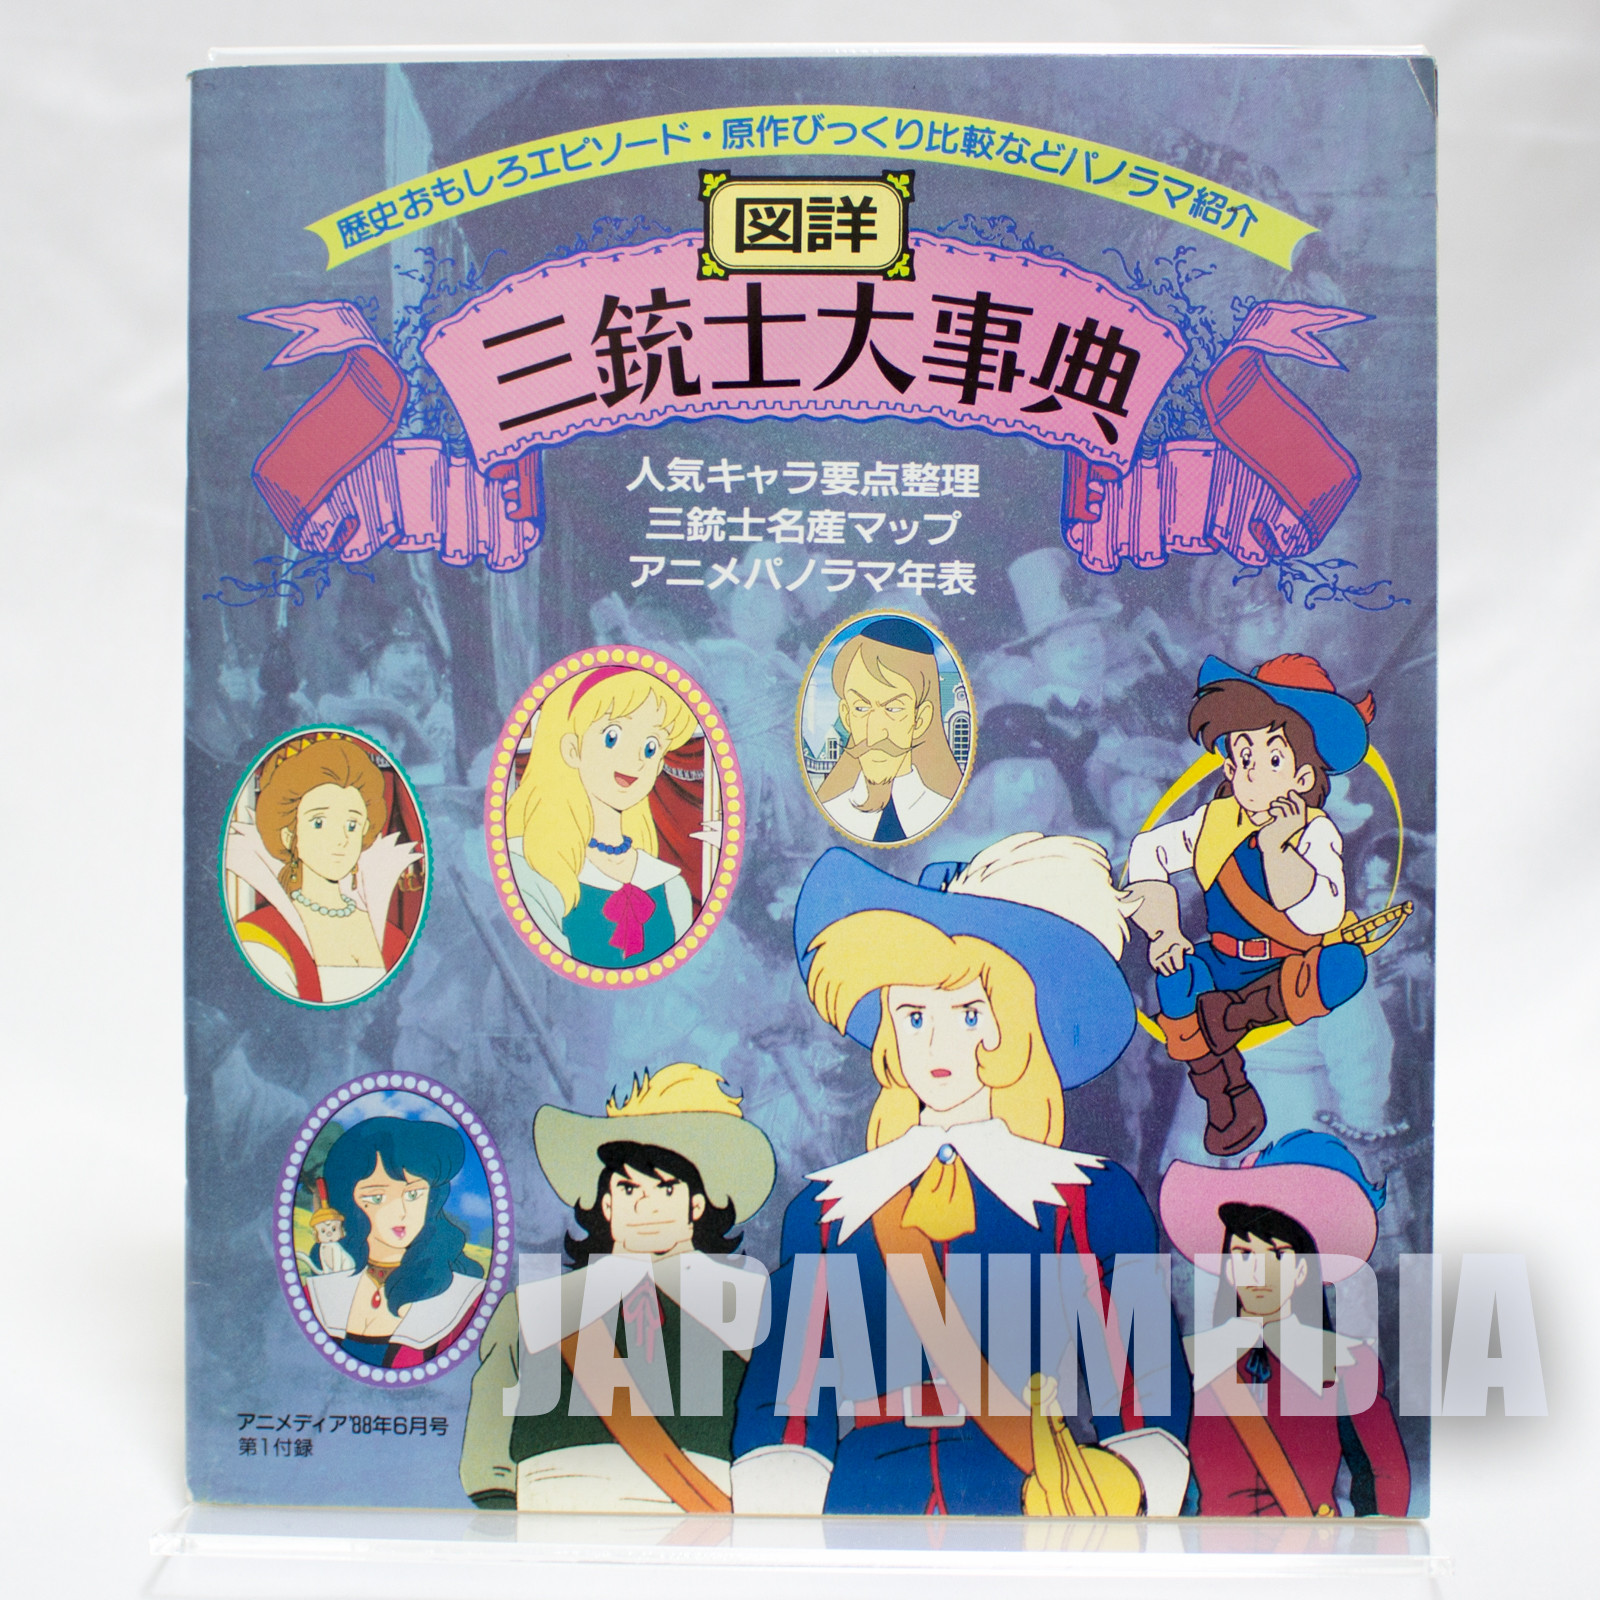 Anime Sanjushi Booklet Animedia 1988 Jun JAPAN The Three Musketeers